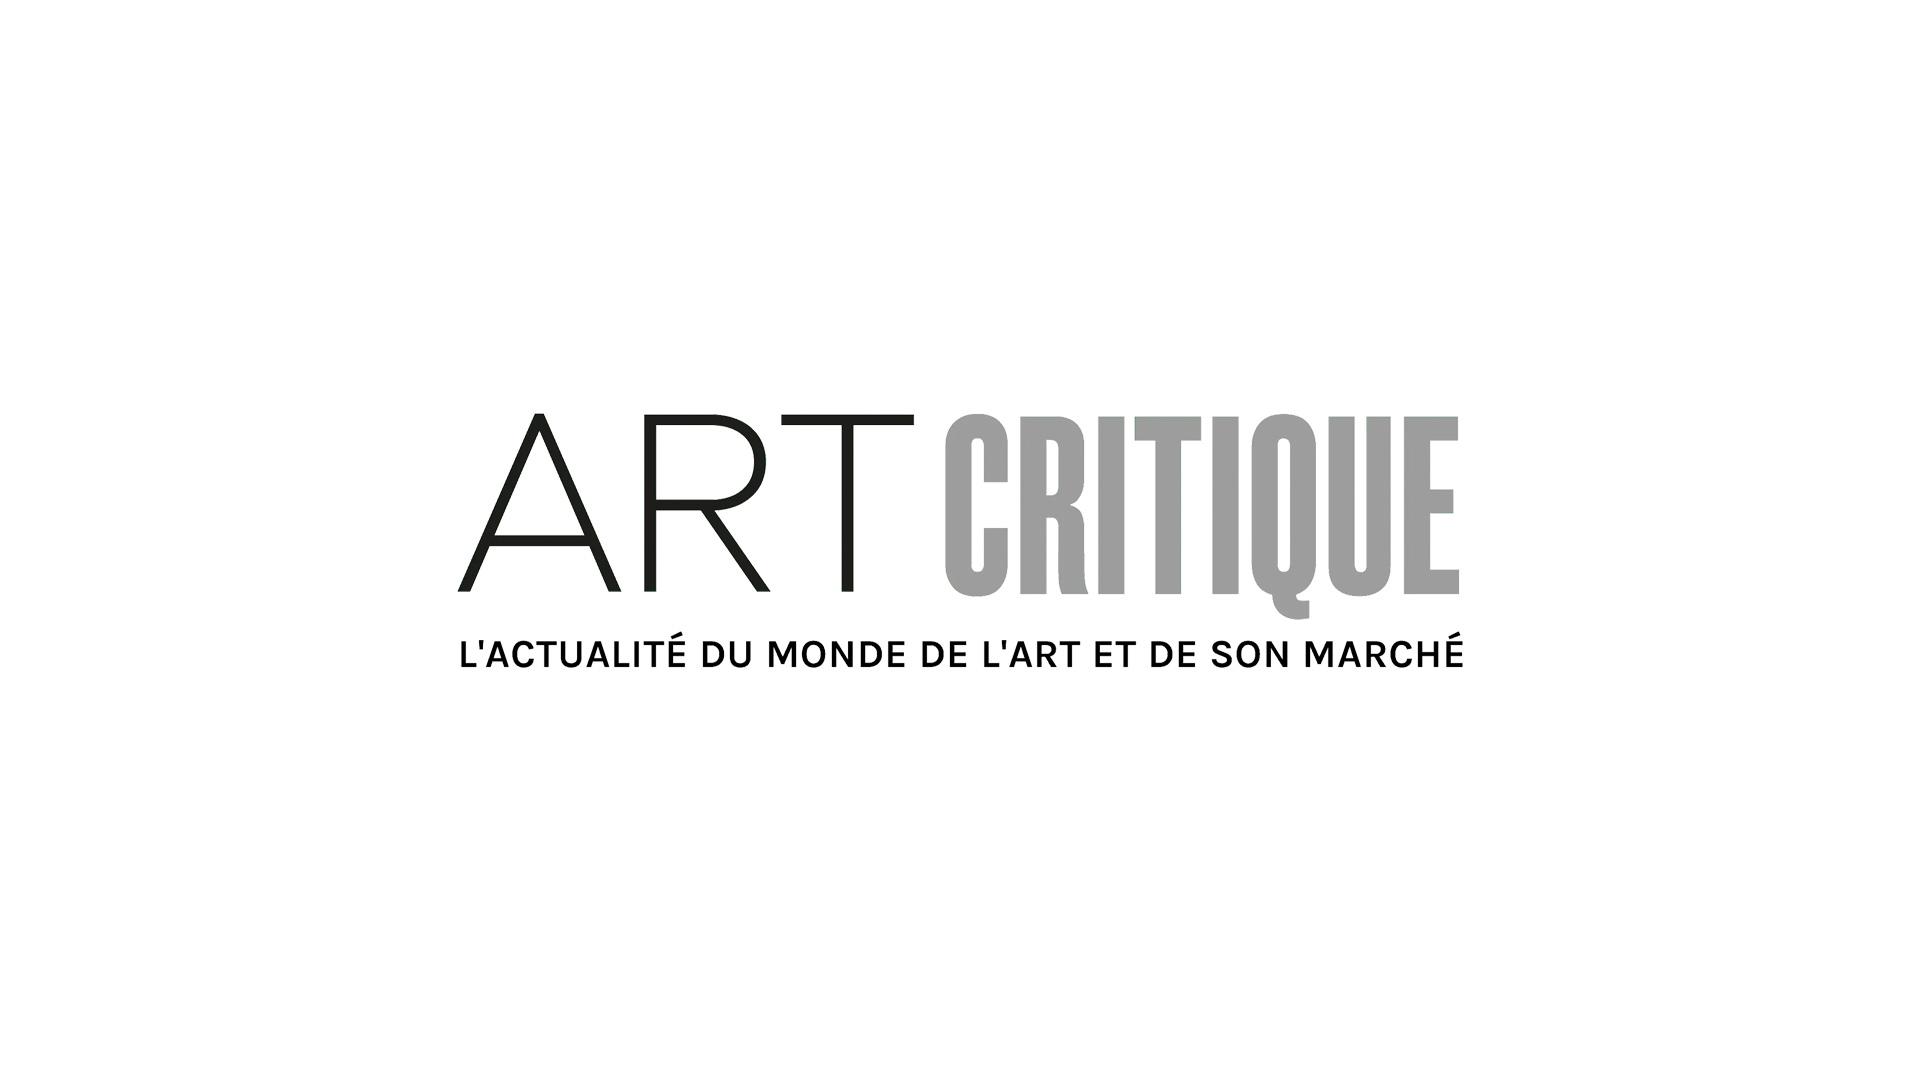 Une calligraphie millionnaire